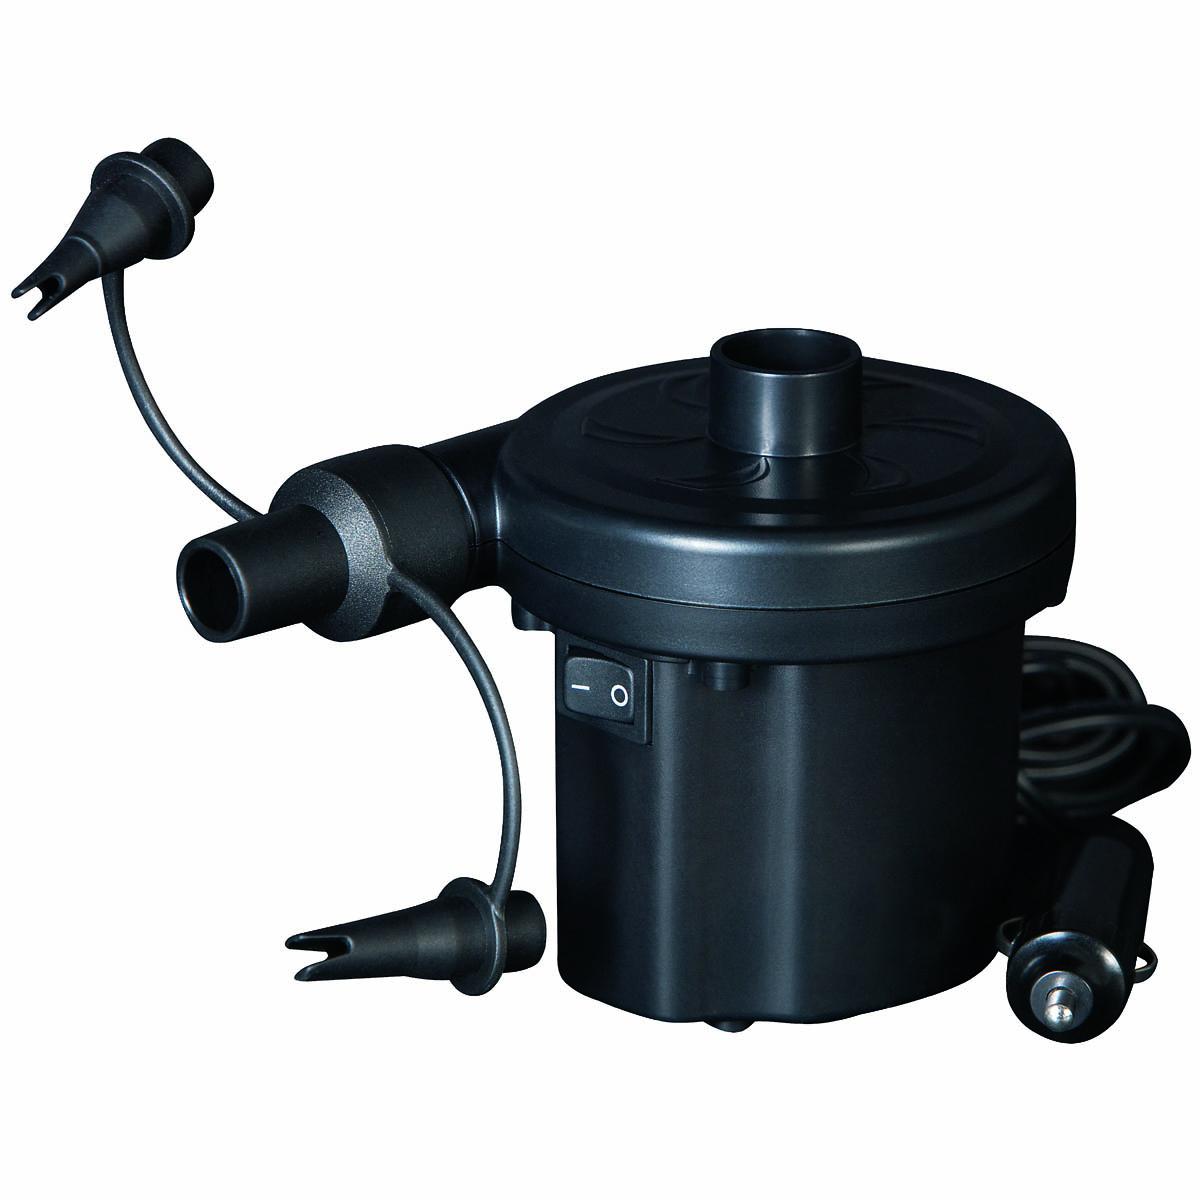 Pumpa vzduchová elektrická 12 V Bestway